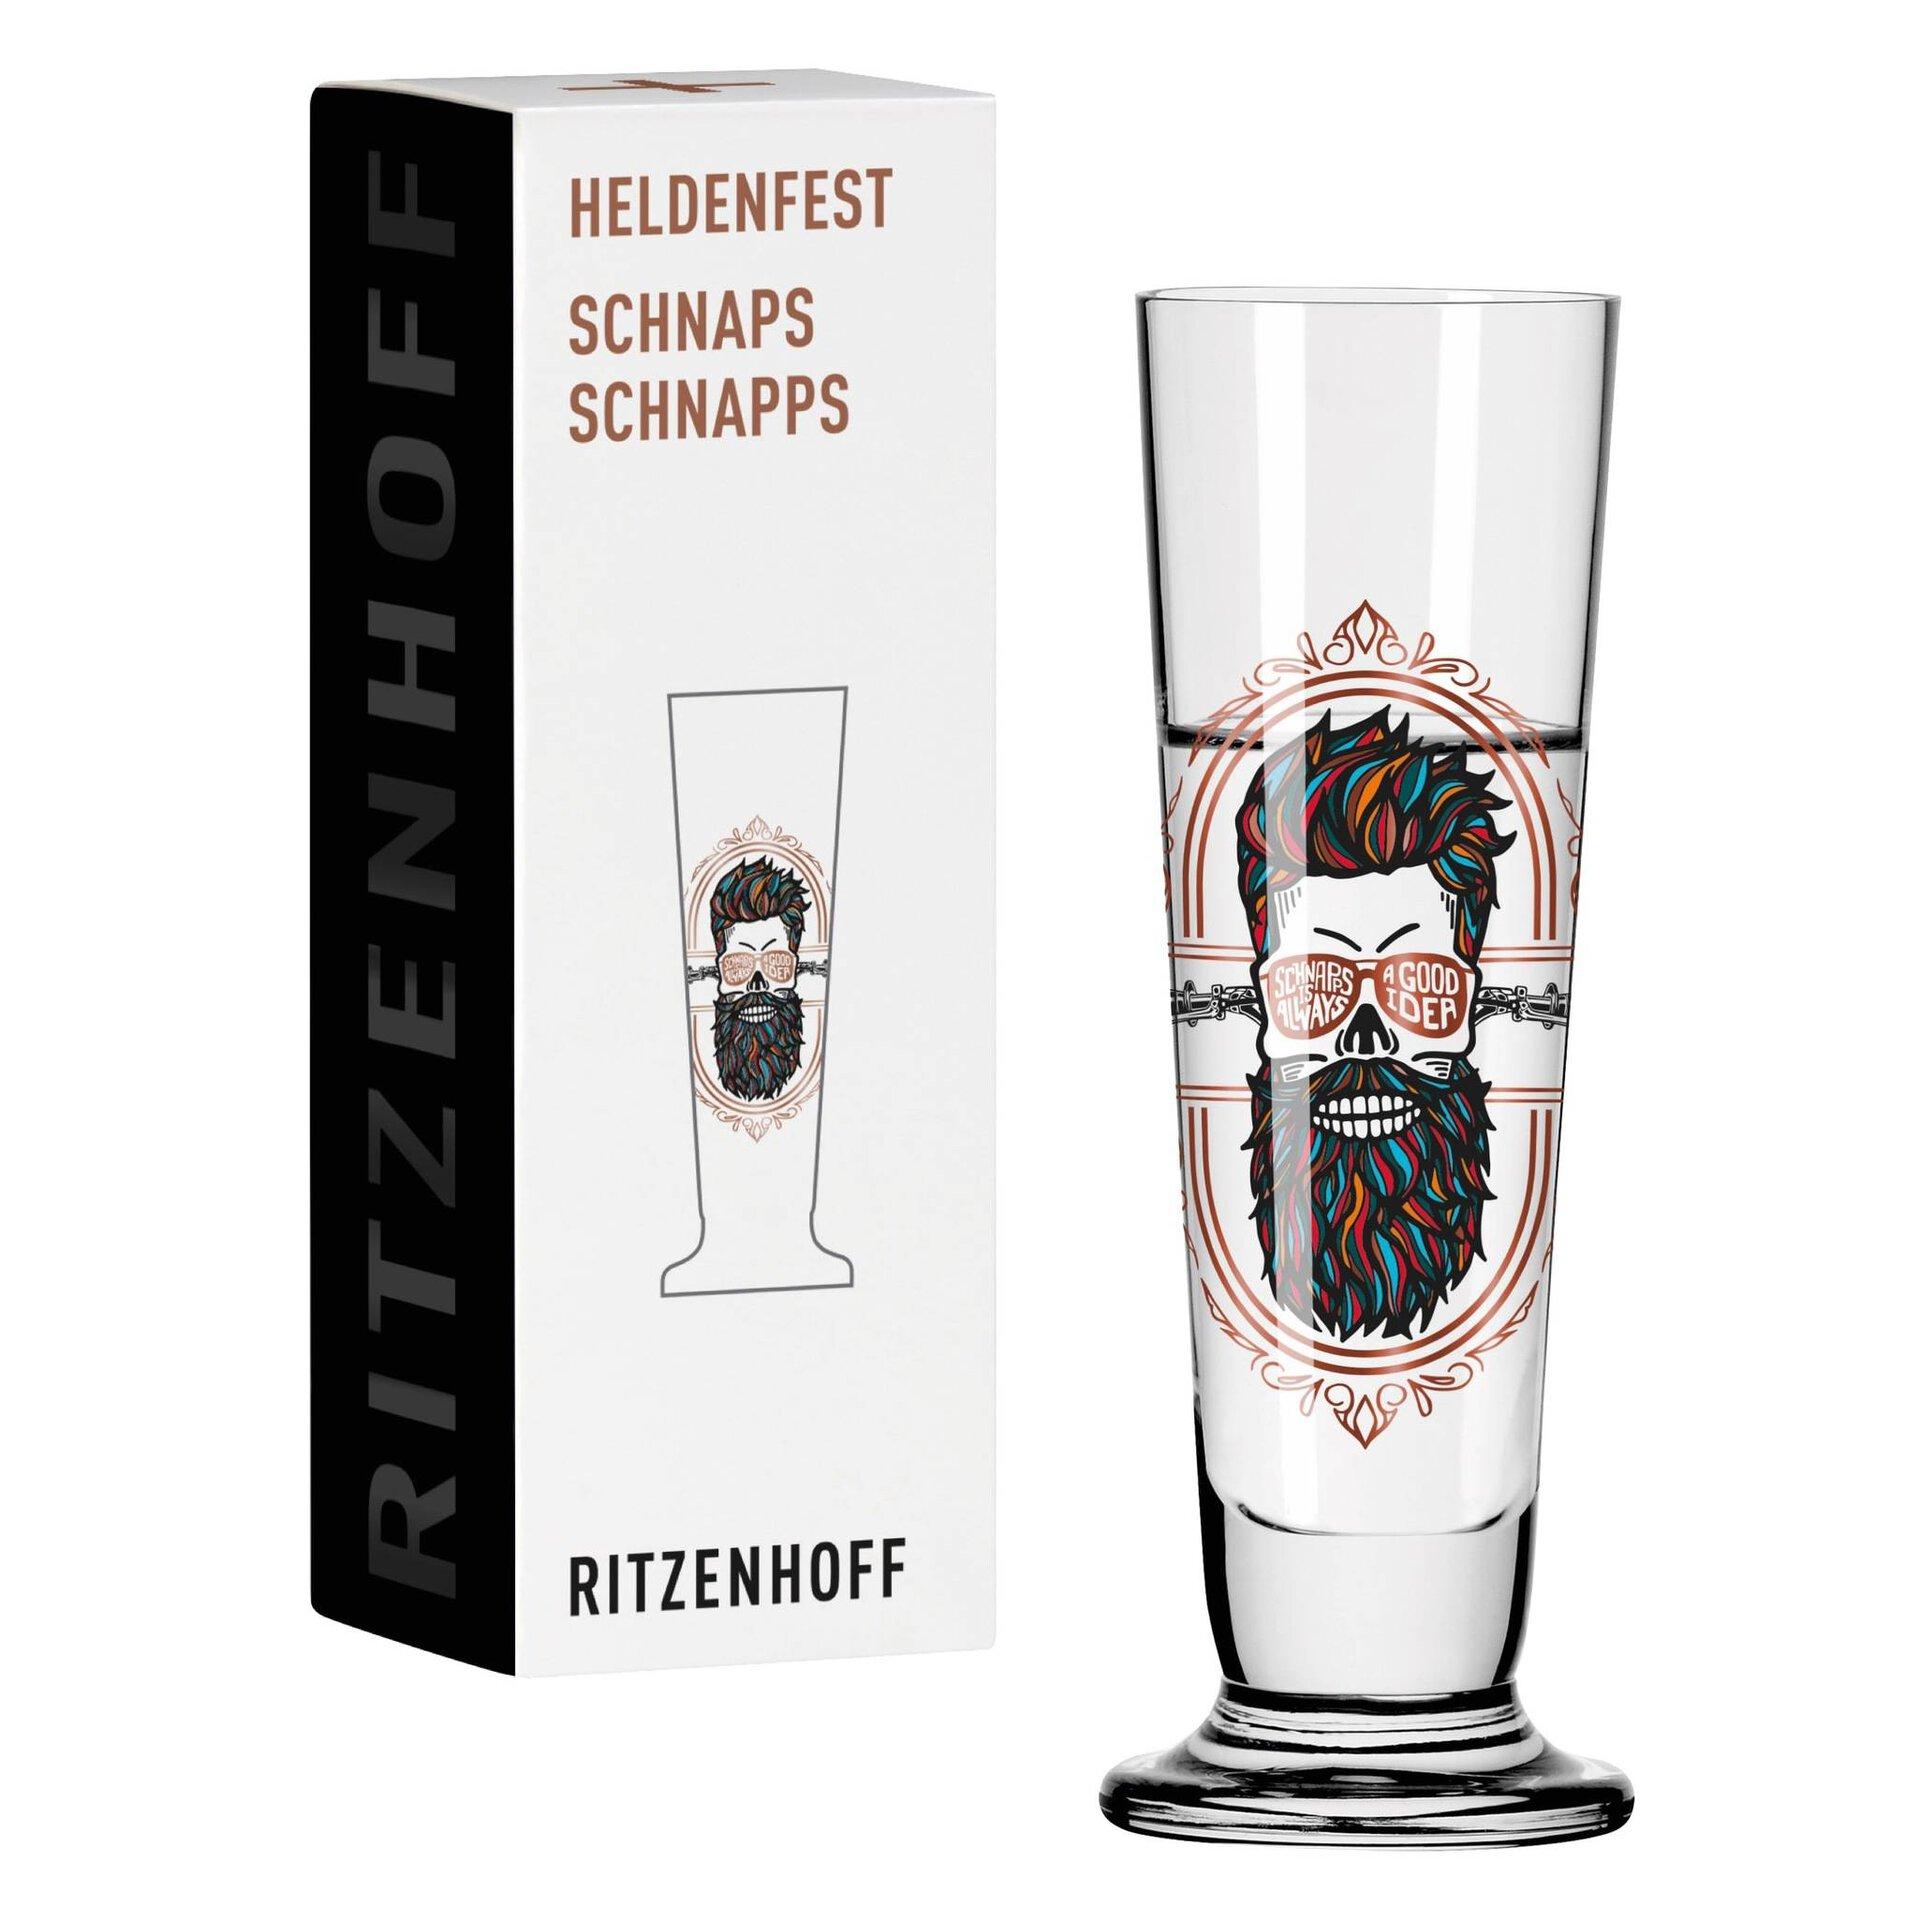 Aperitifglas Heldenfest Schnaps 004 Ritzenhoff Glas 11 x